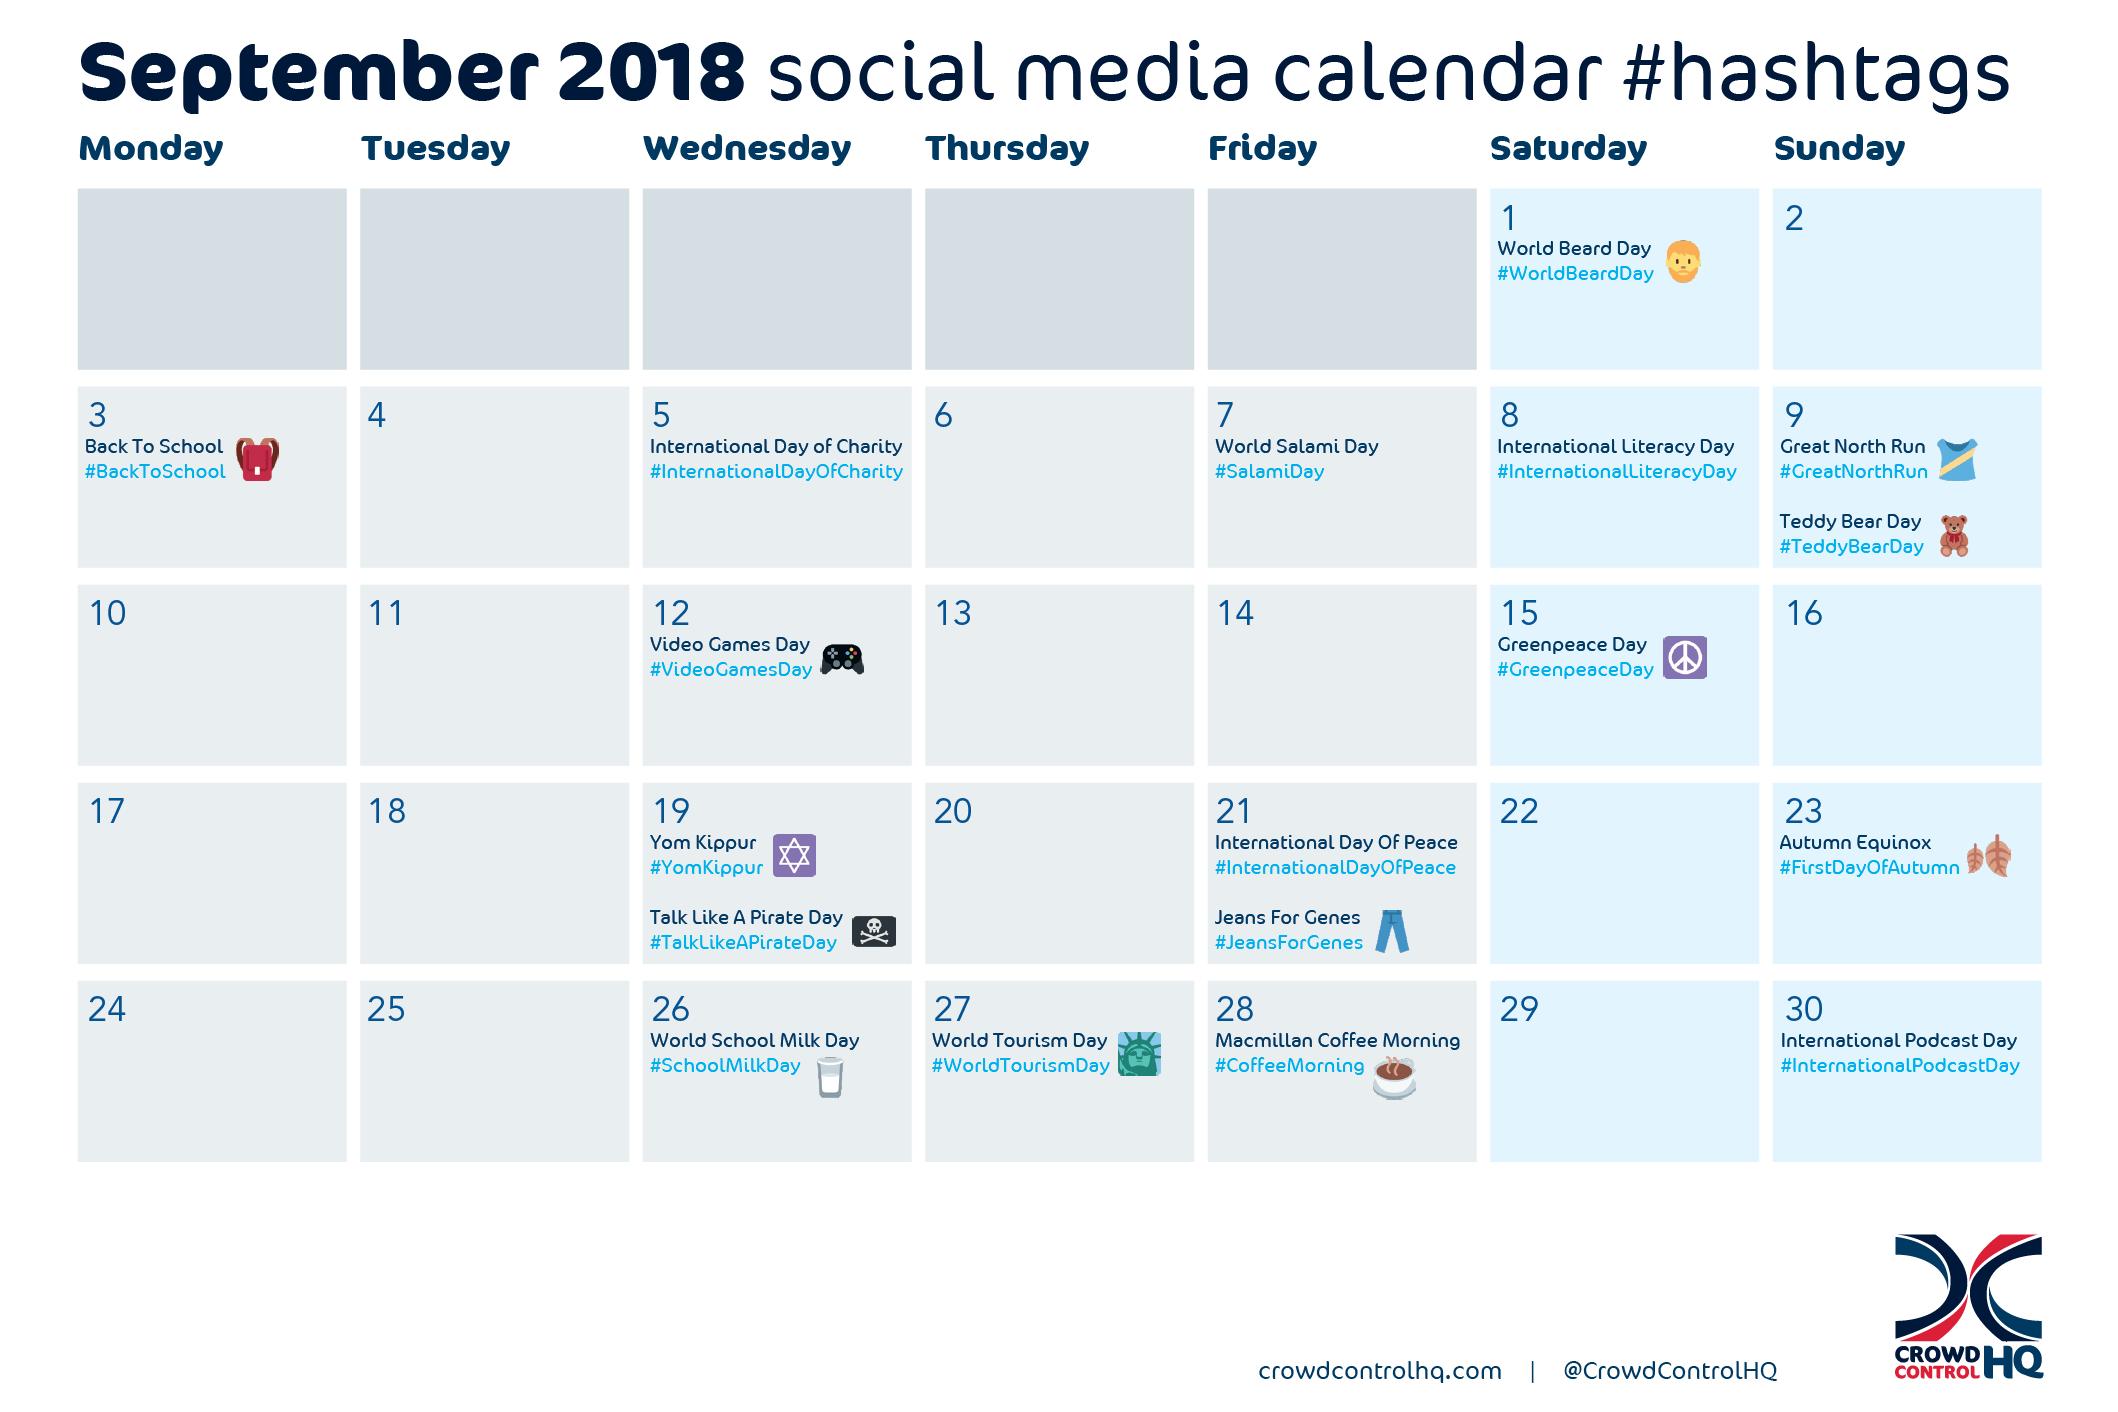 September 2018 Social Media Calendar Content Hashtag Ideas